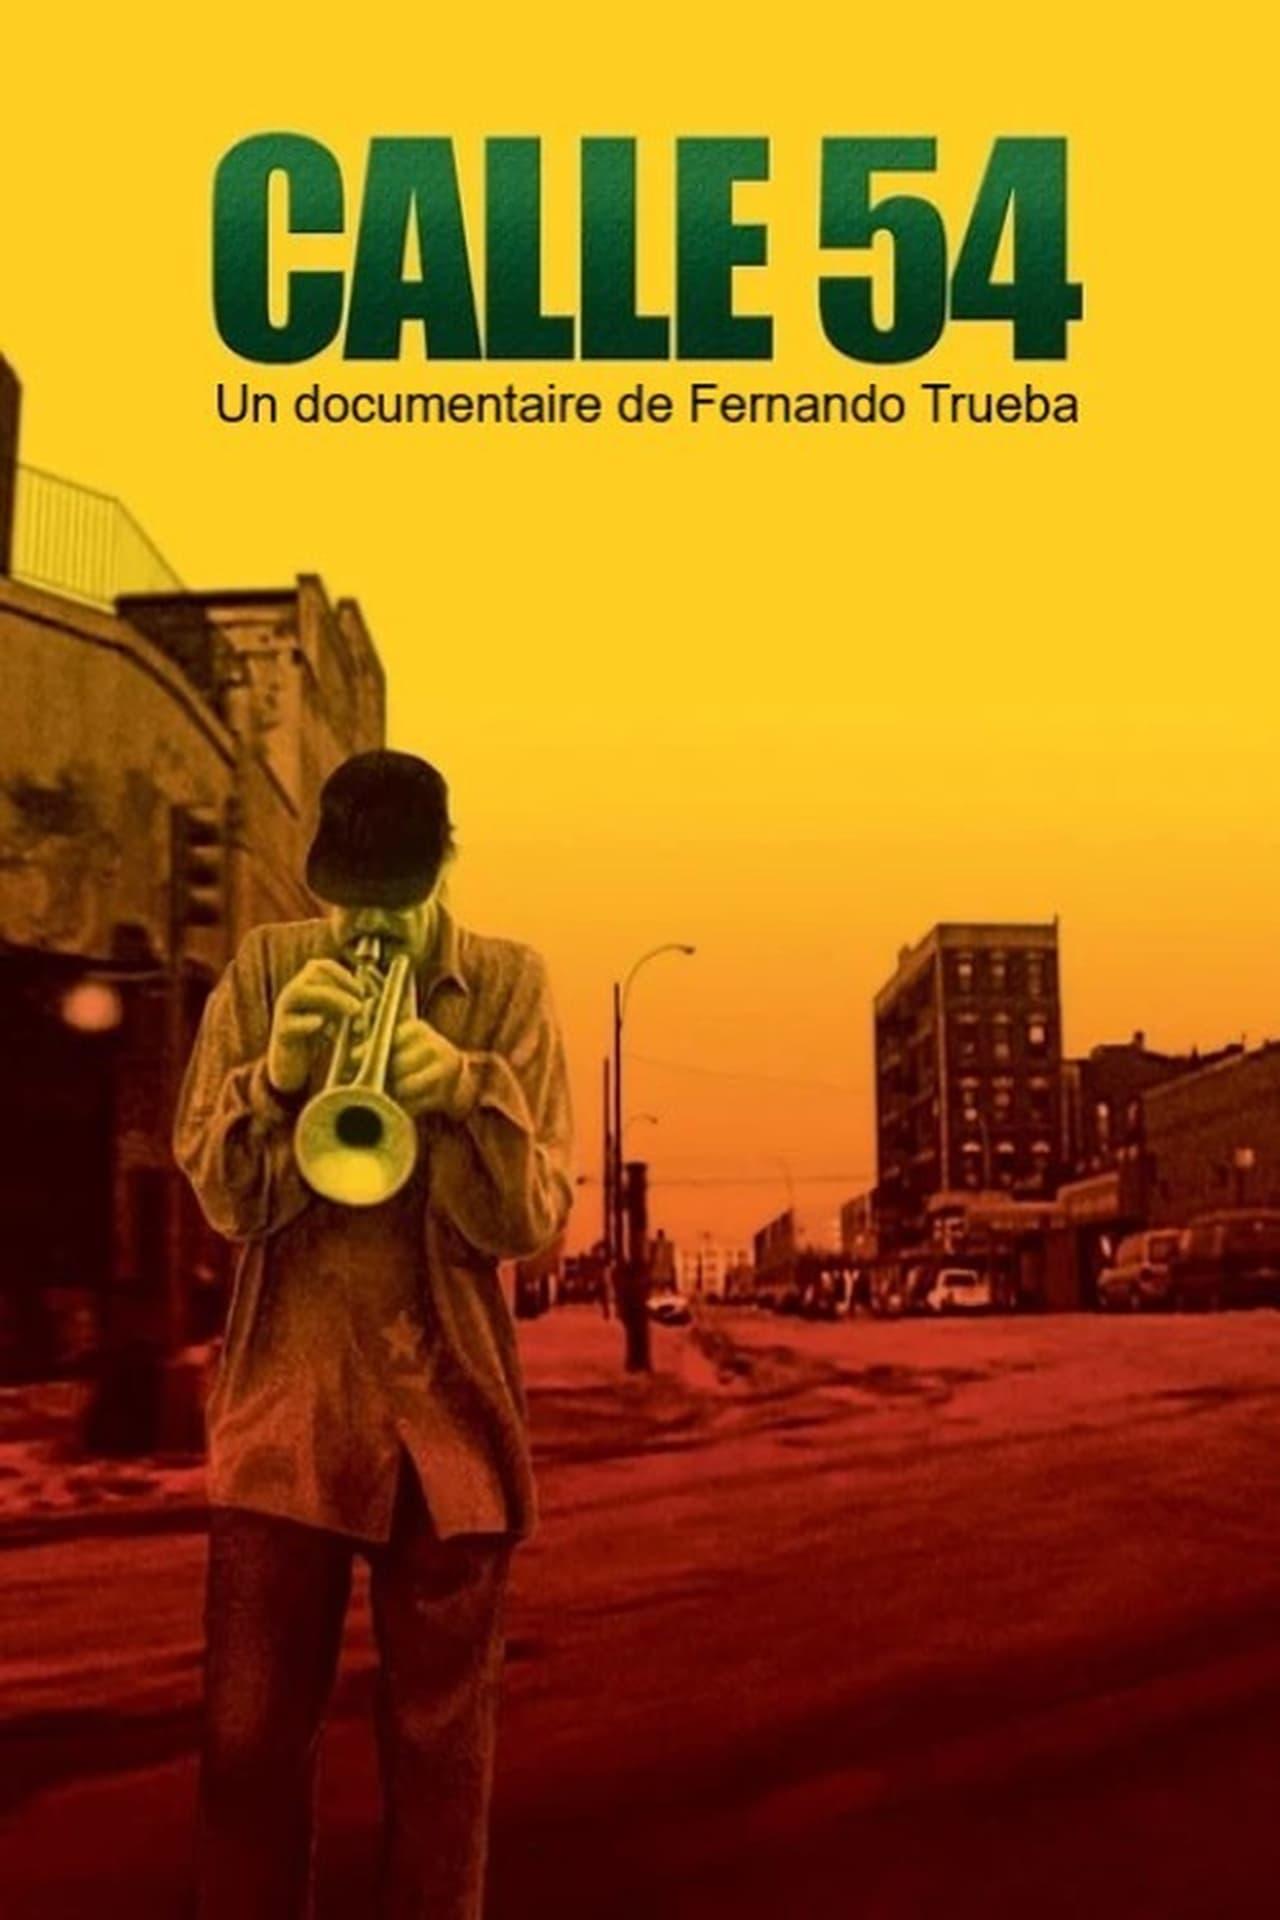 Calle 54 (2000)